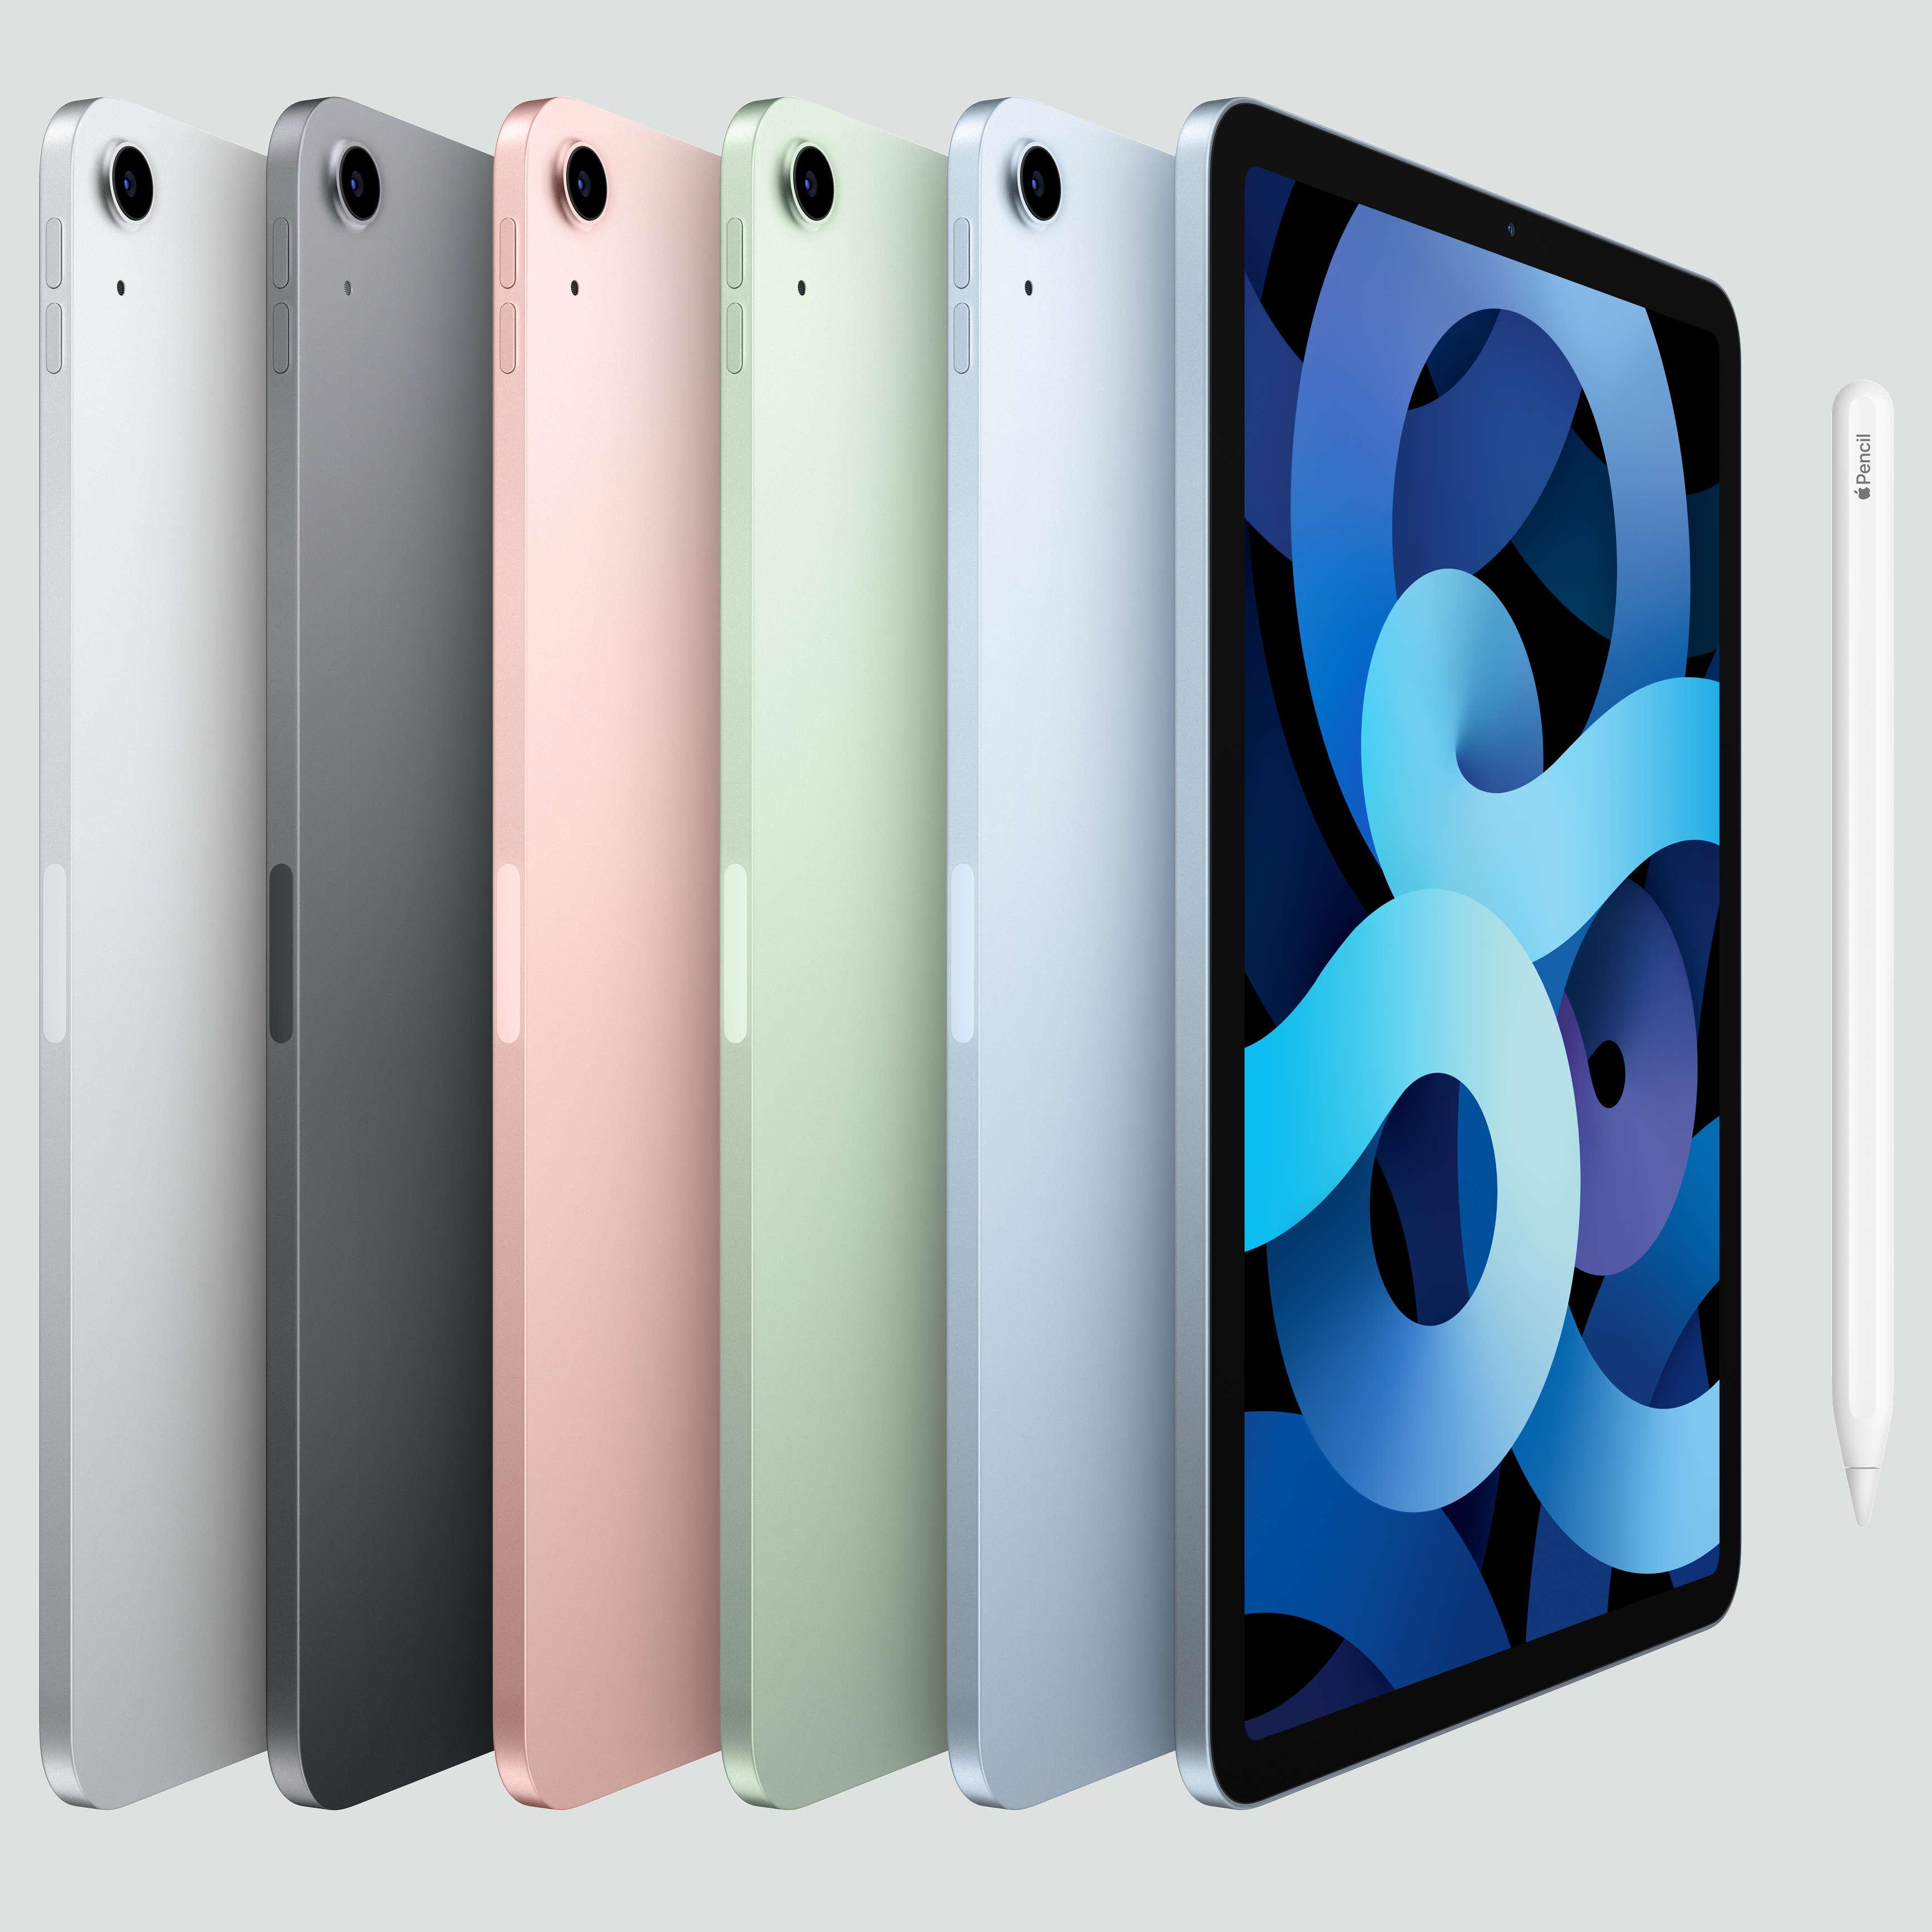 iPad Air (4th gen) tuoteperhe